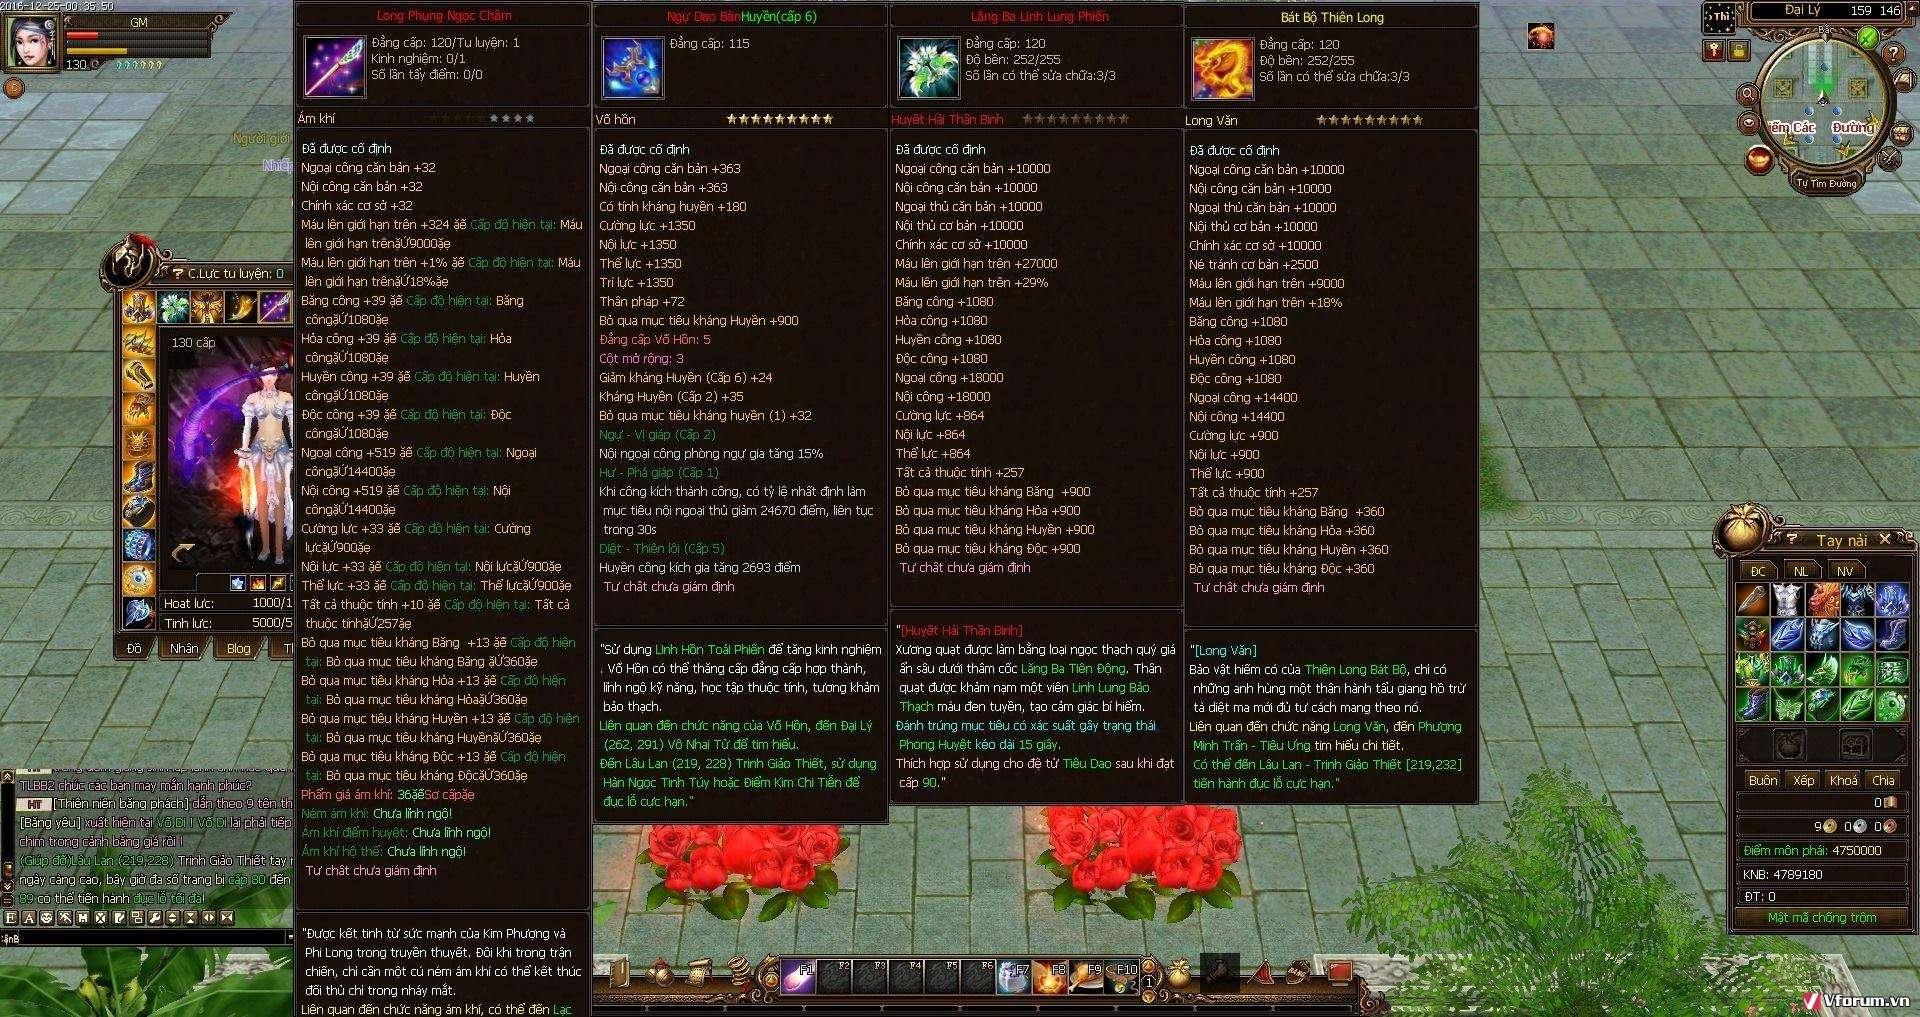 [TL CHANGYOU] - Cs 3.0 - OPEN 14H T6 03/11 - FREE 99% - SĂN VIP, DMP - NHẬN CODE GAME - EVE ZEKU15